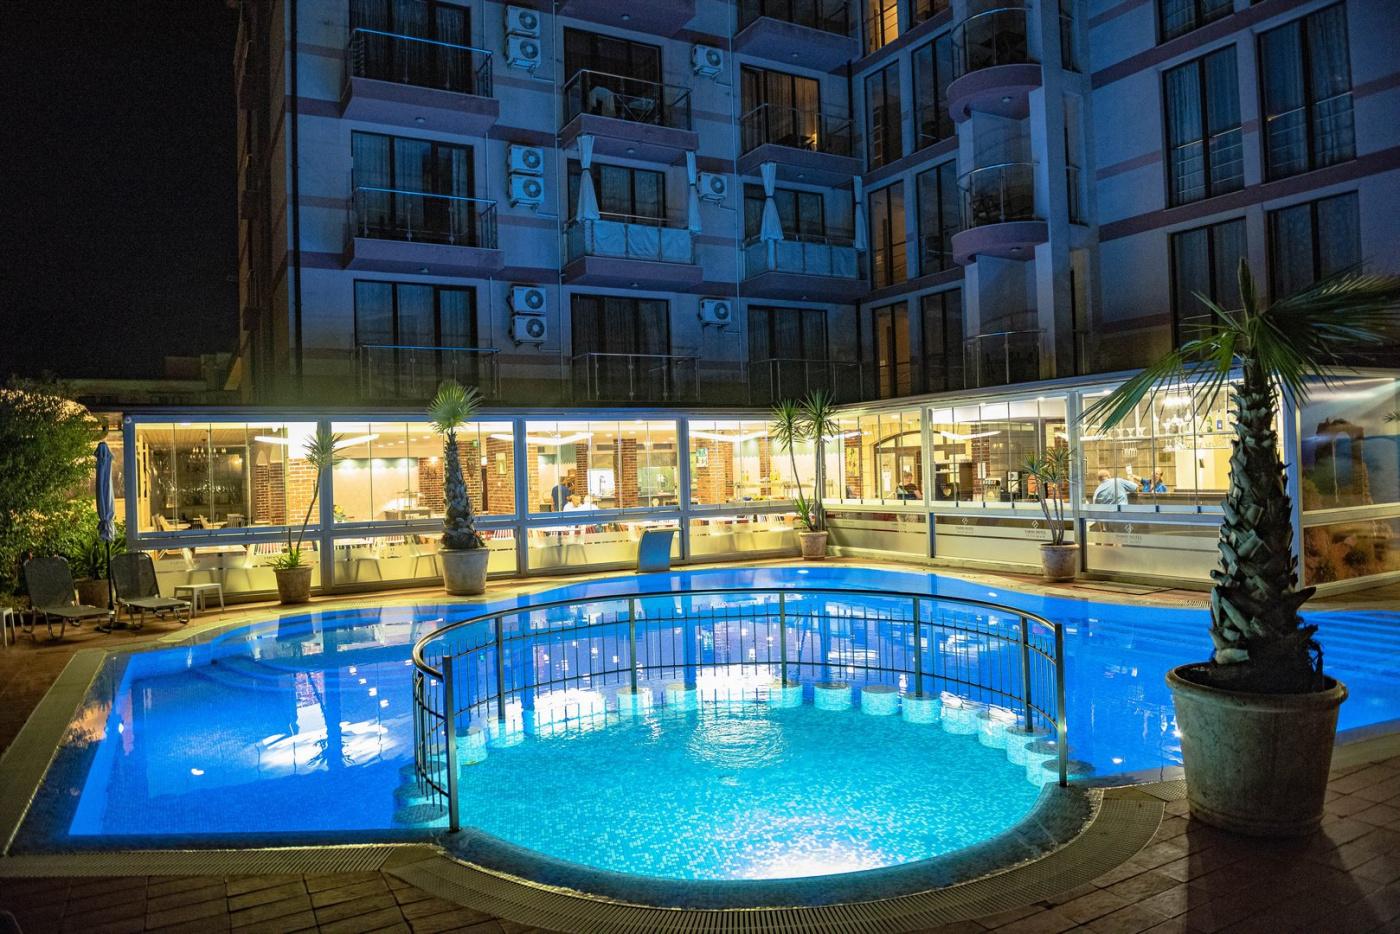 Tarsis Апарт-отель